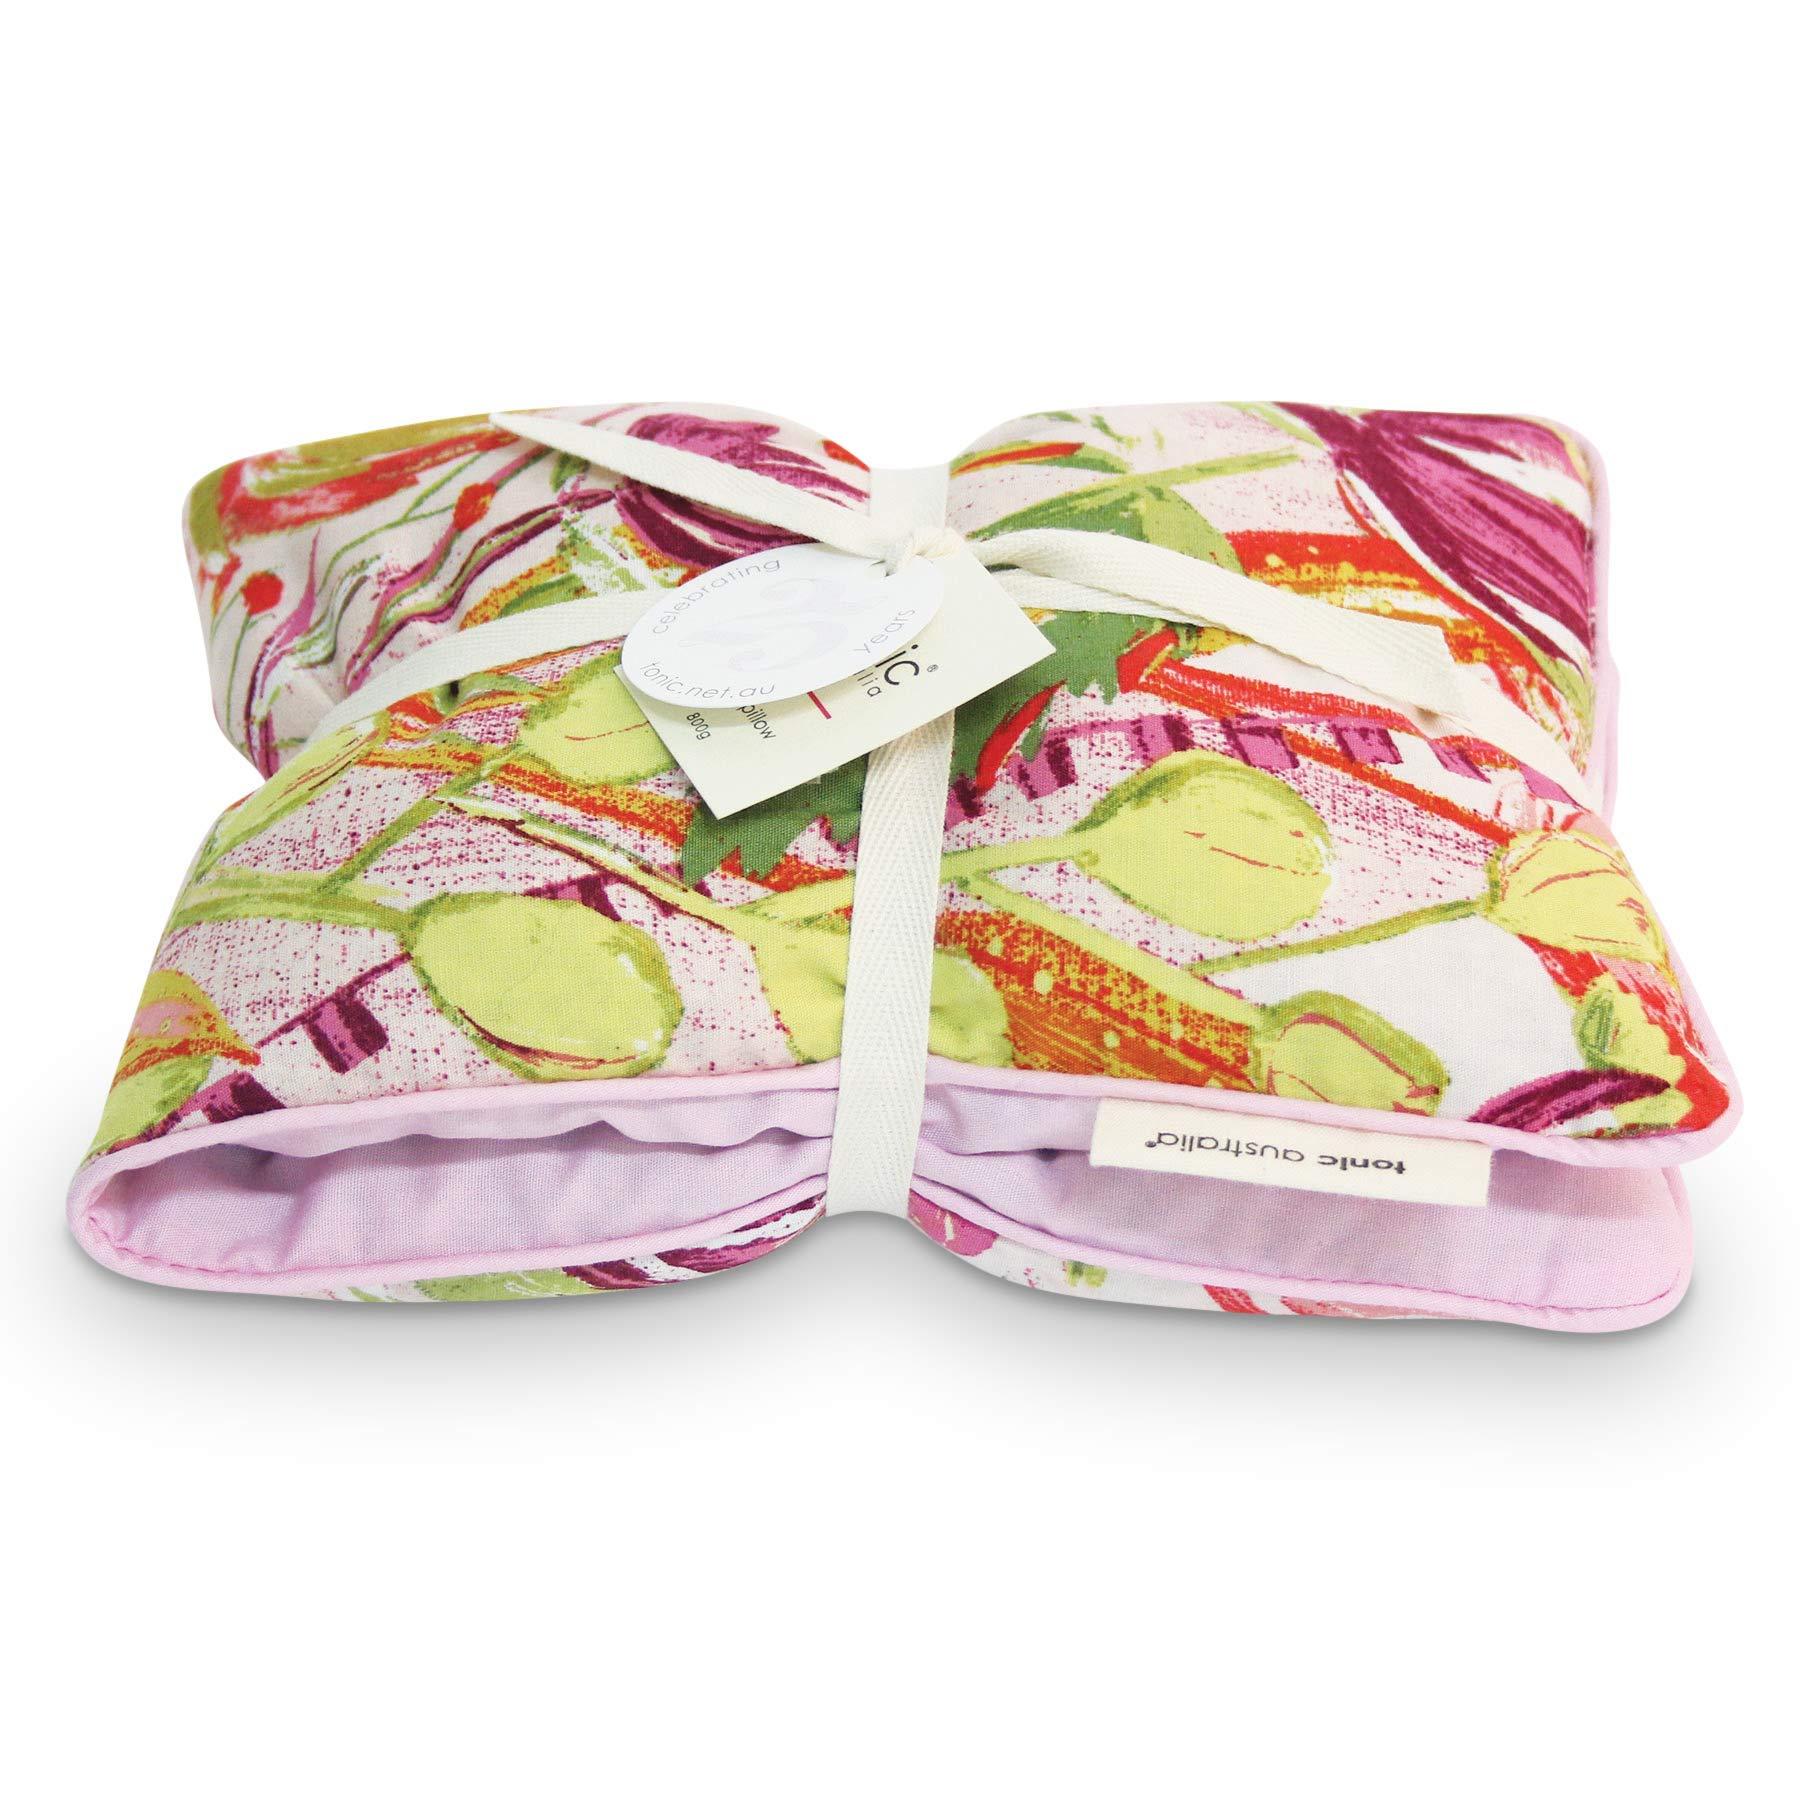 Tonic Australia Stress Relief Heat Pillow Pink Bell Flowers Lavender